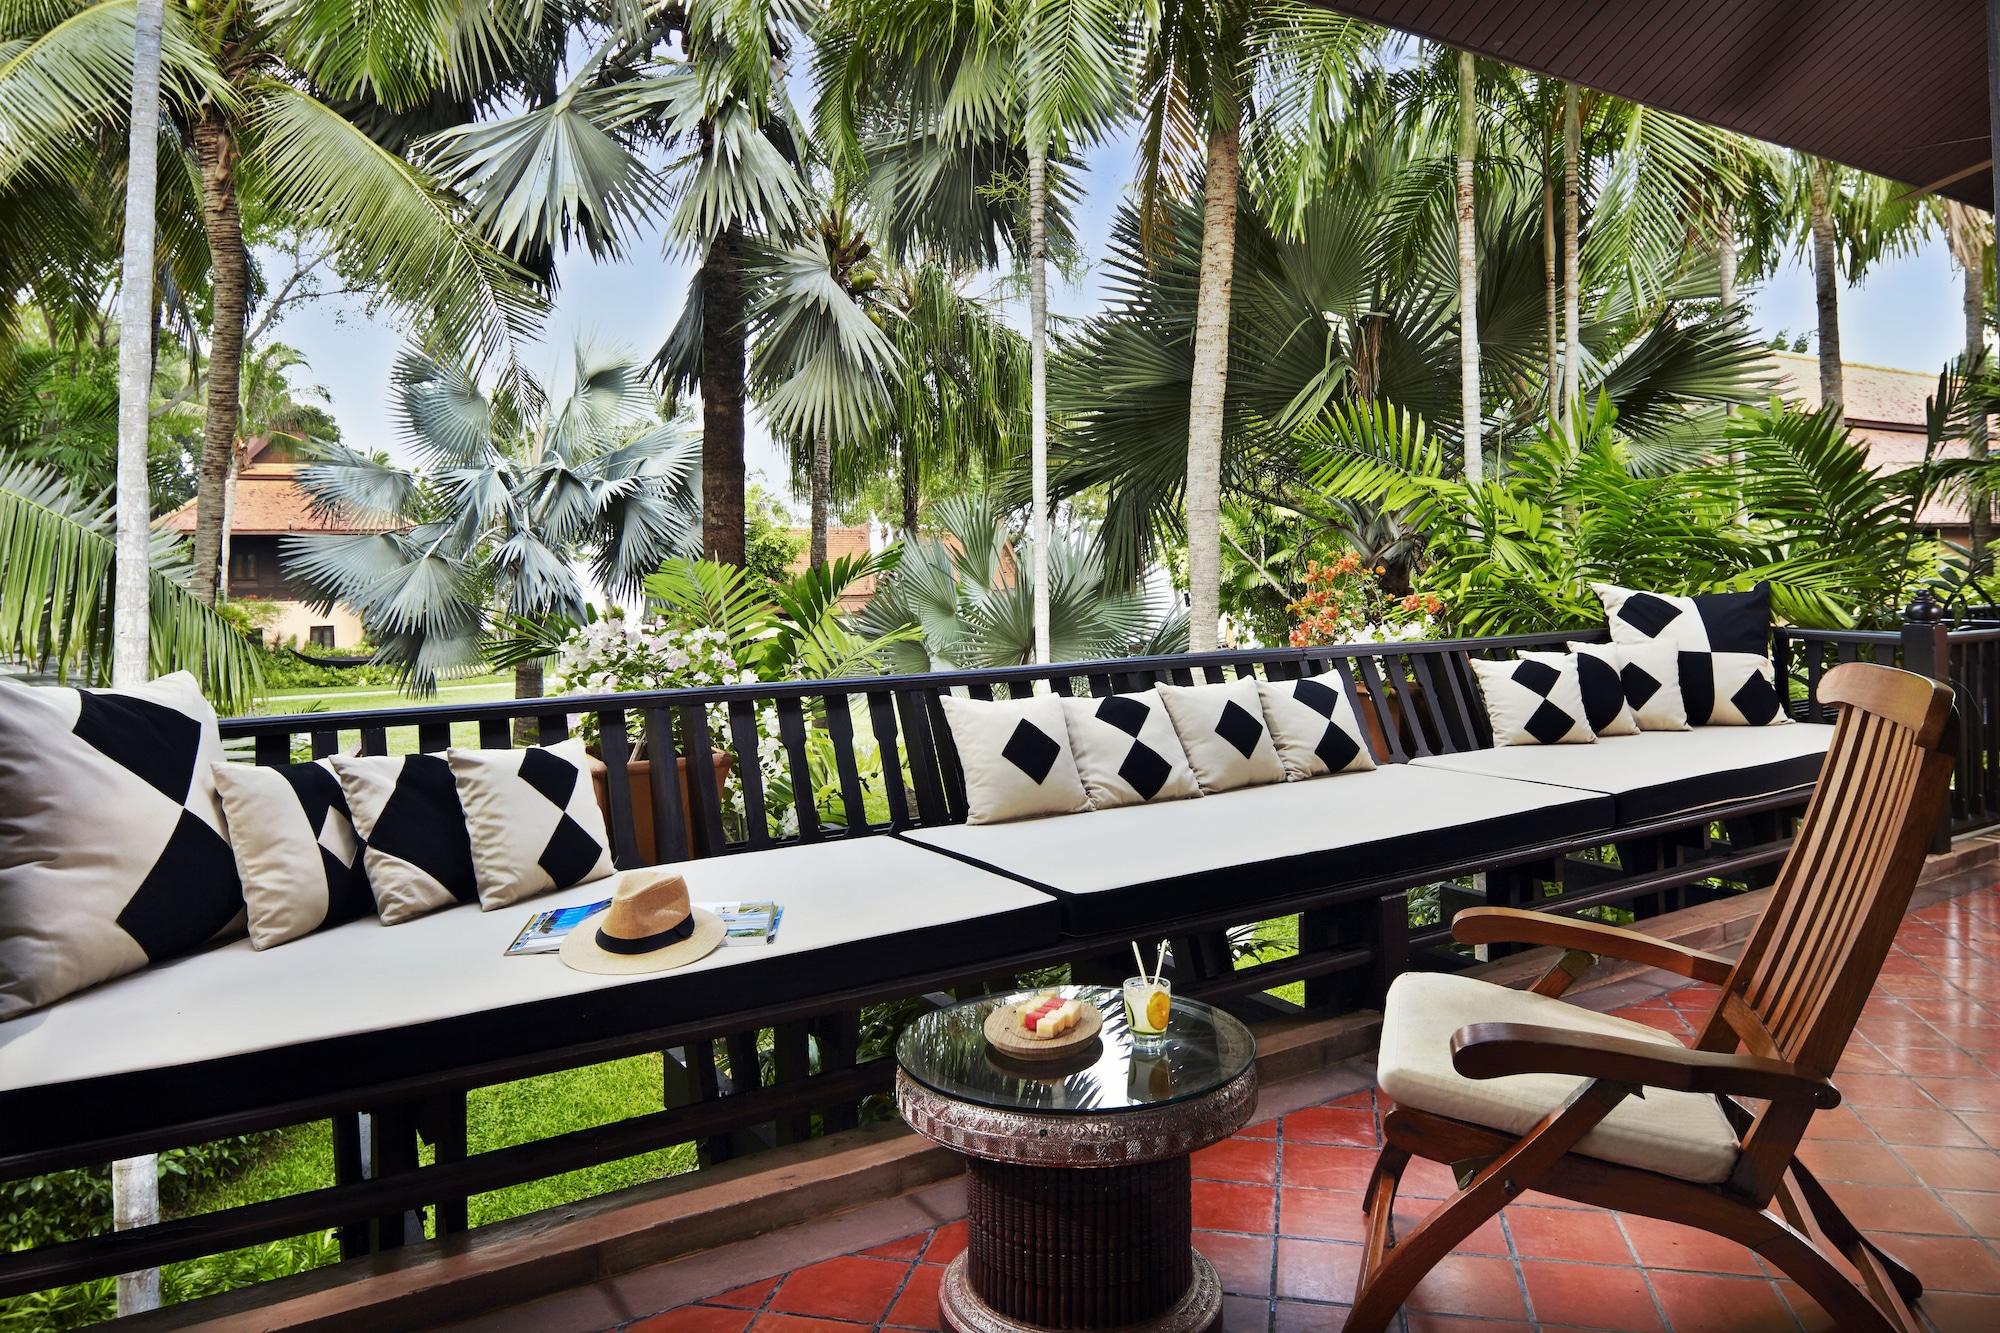 Anantara Garden View Suite